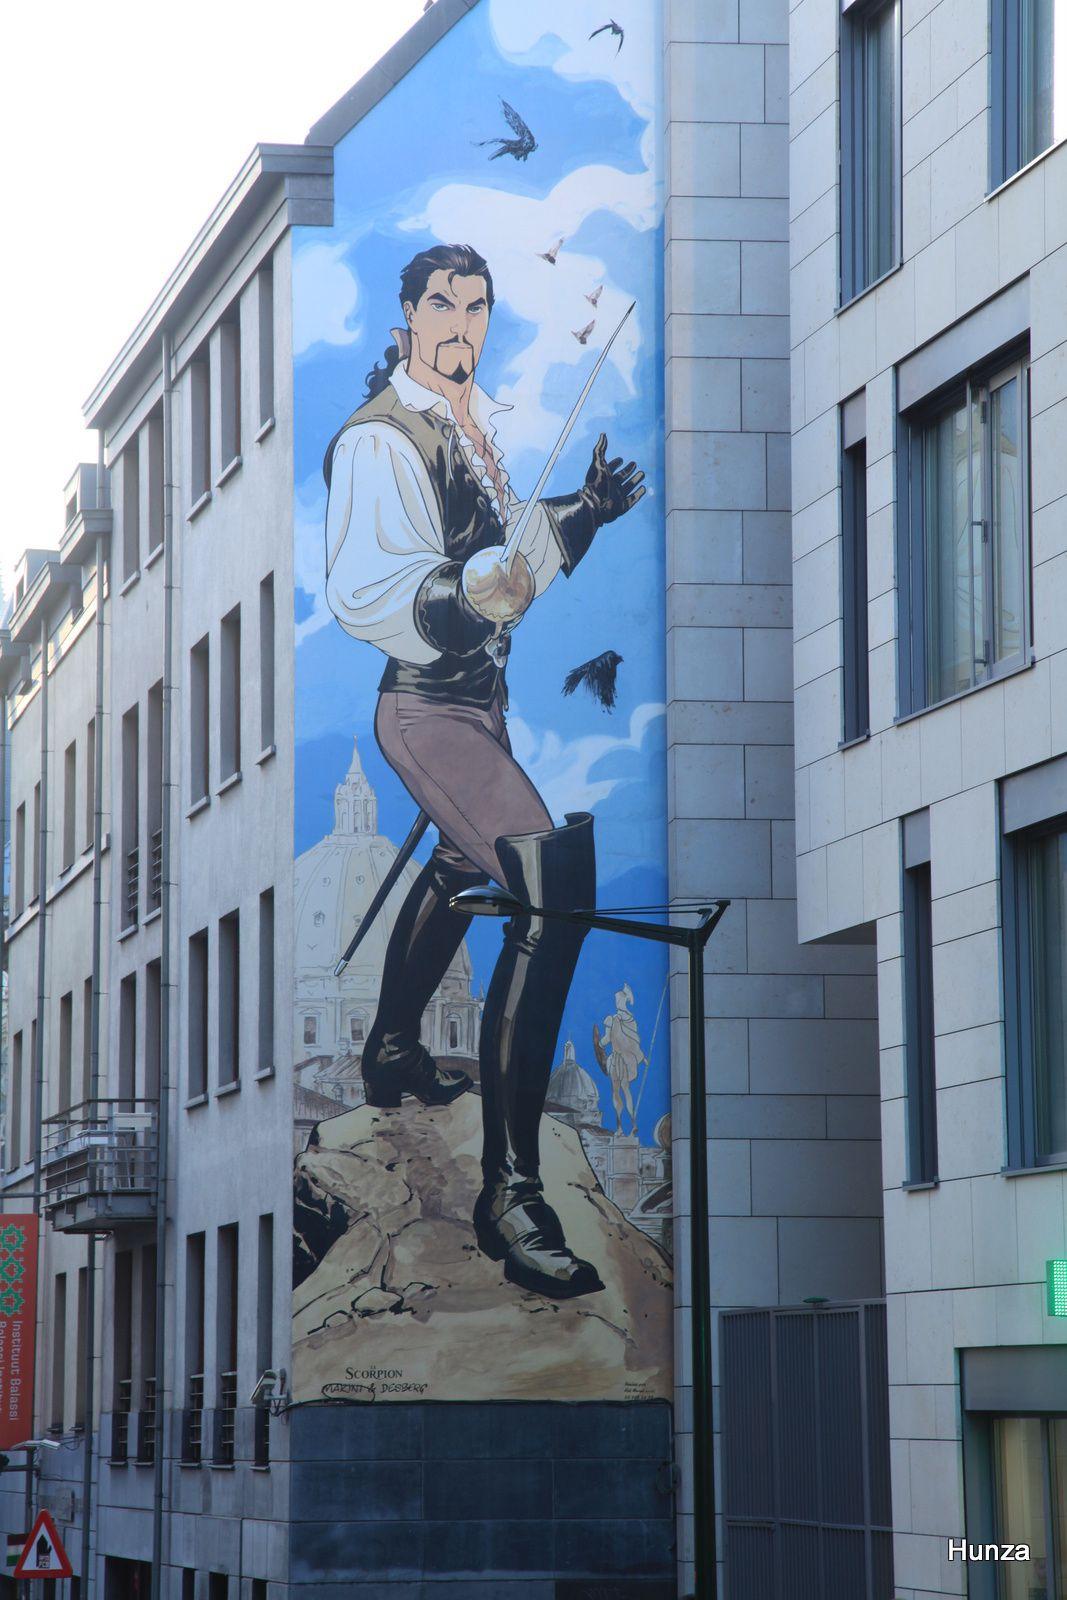 Bruxelles, fresque murale le scorpion de Marini et Desberg